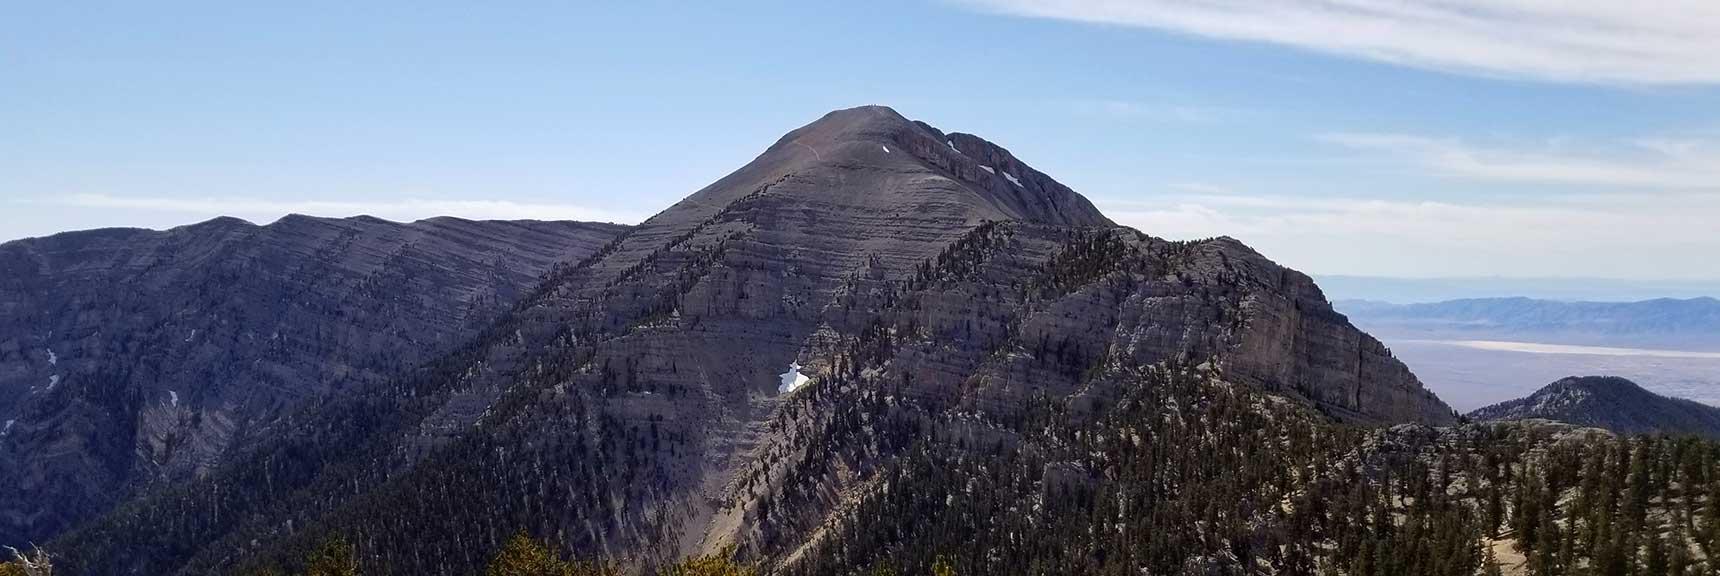 Charleston Peak Viewed from Lee Peak in Kyle Canyon, Spring Mountains, Nevada Slide 001